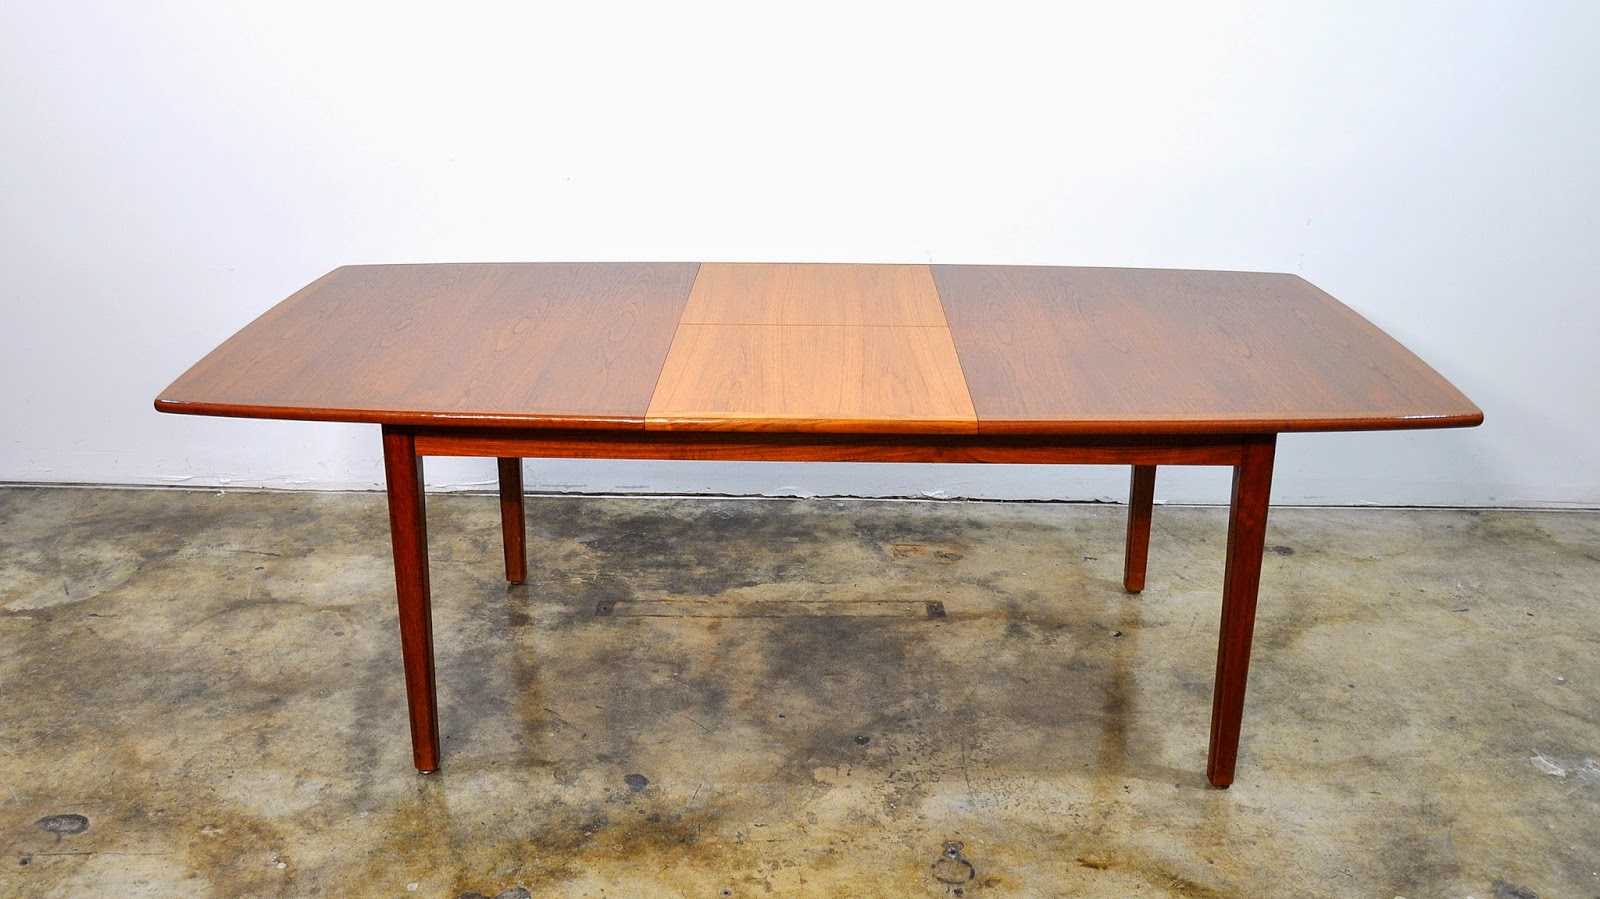 SELECT MODERN Falster Teak Expandable Dining Table : FalsterTeakDiningTable2 from midcenturymoderndesignfinds.blogspot.com size 1600 x 899 jpeg 277kB